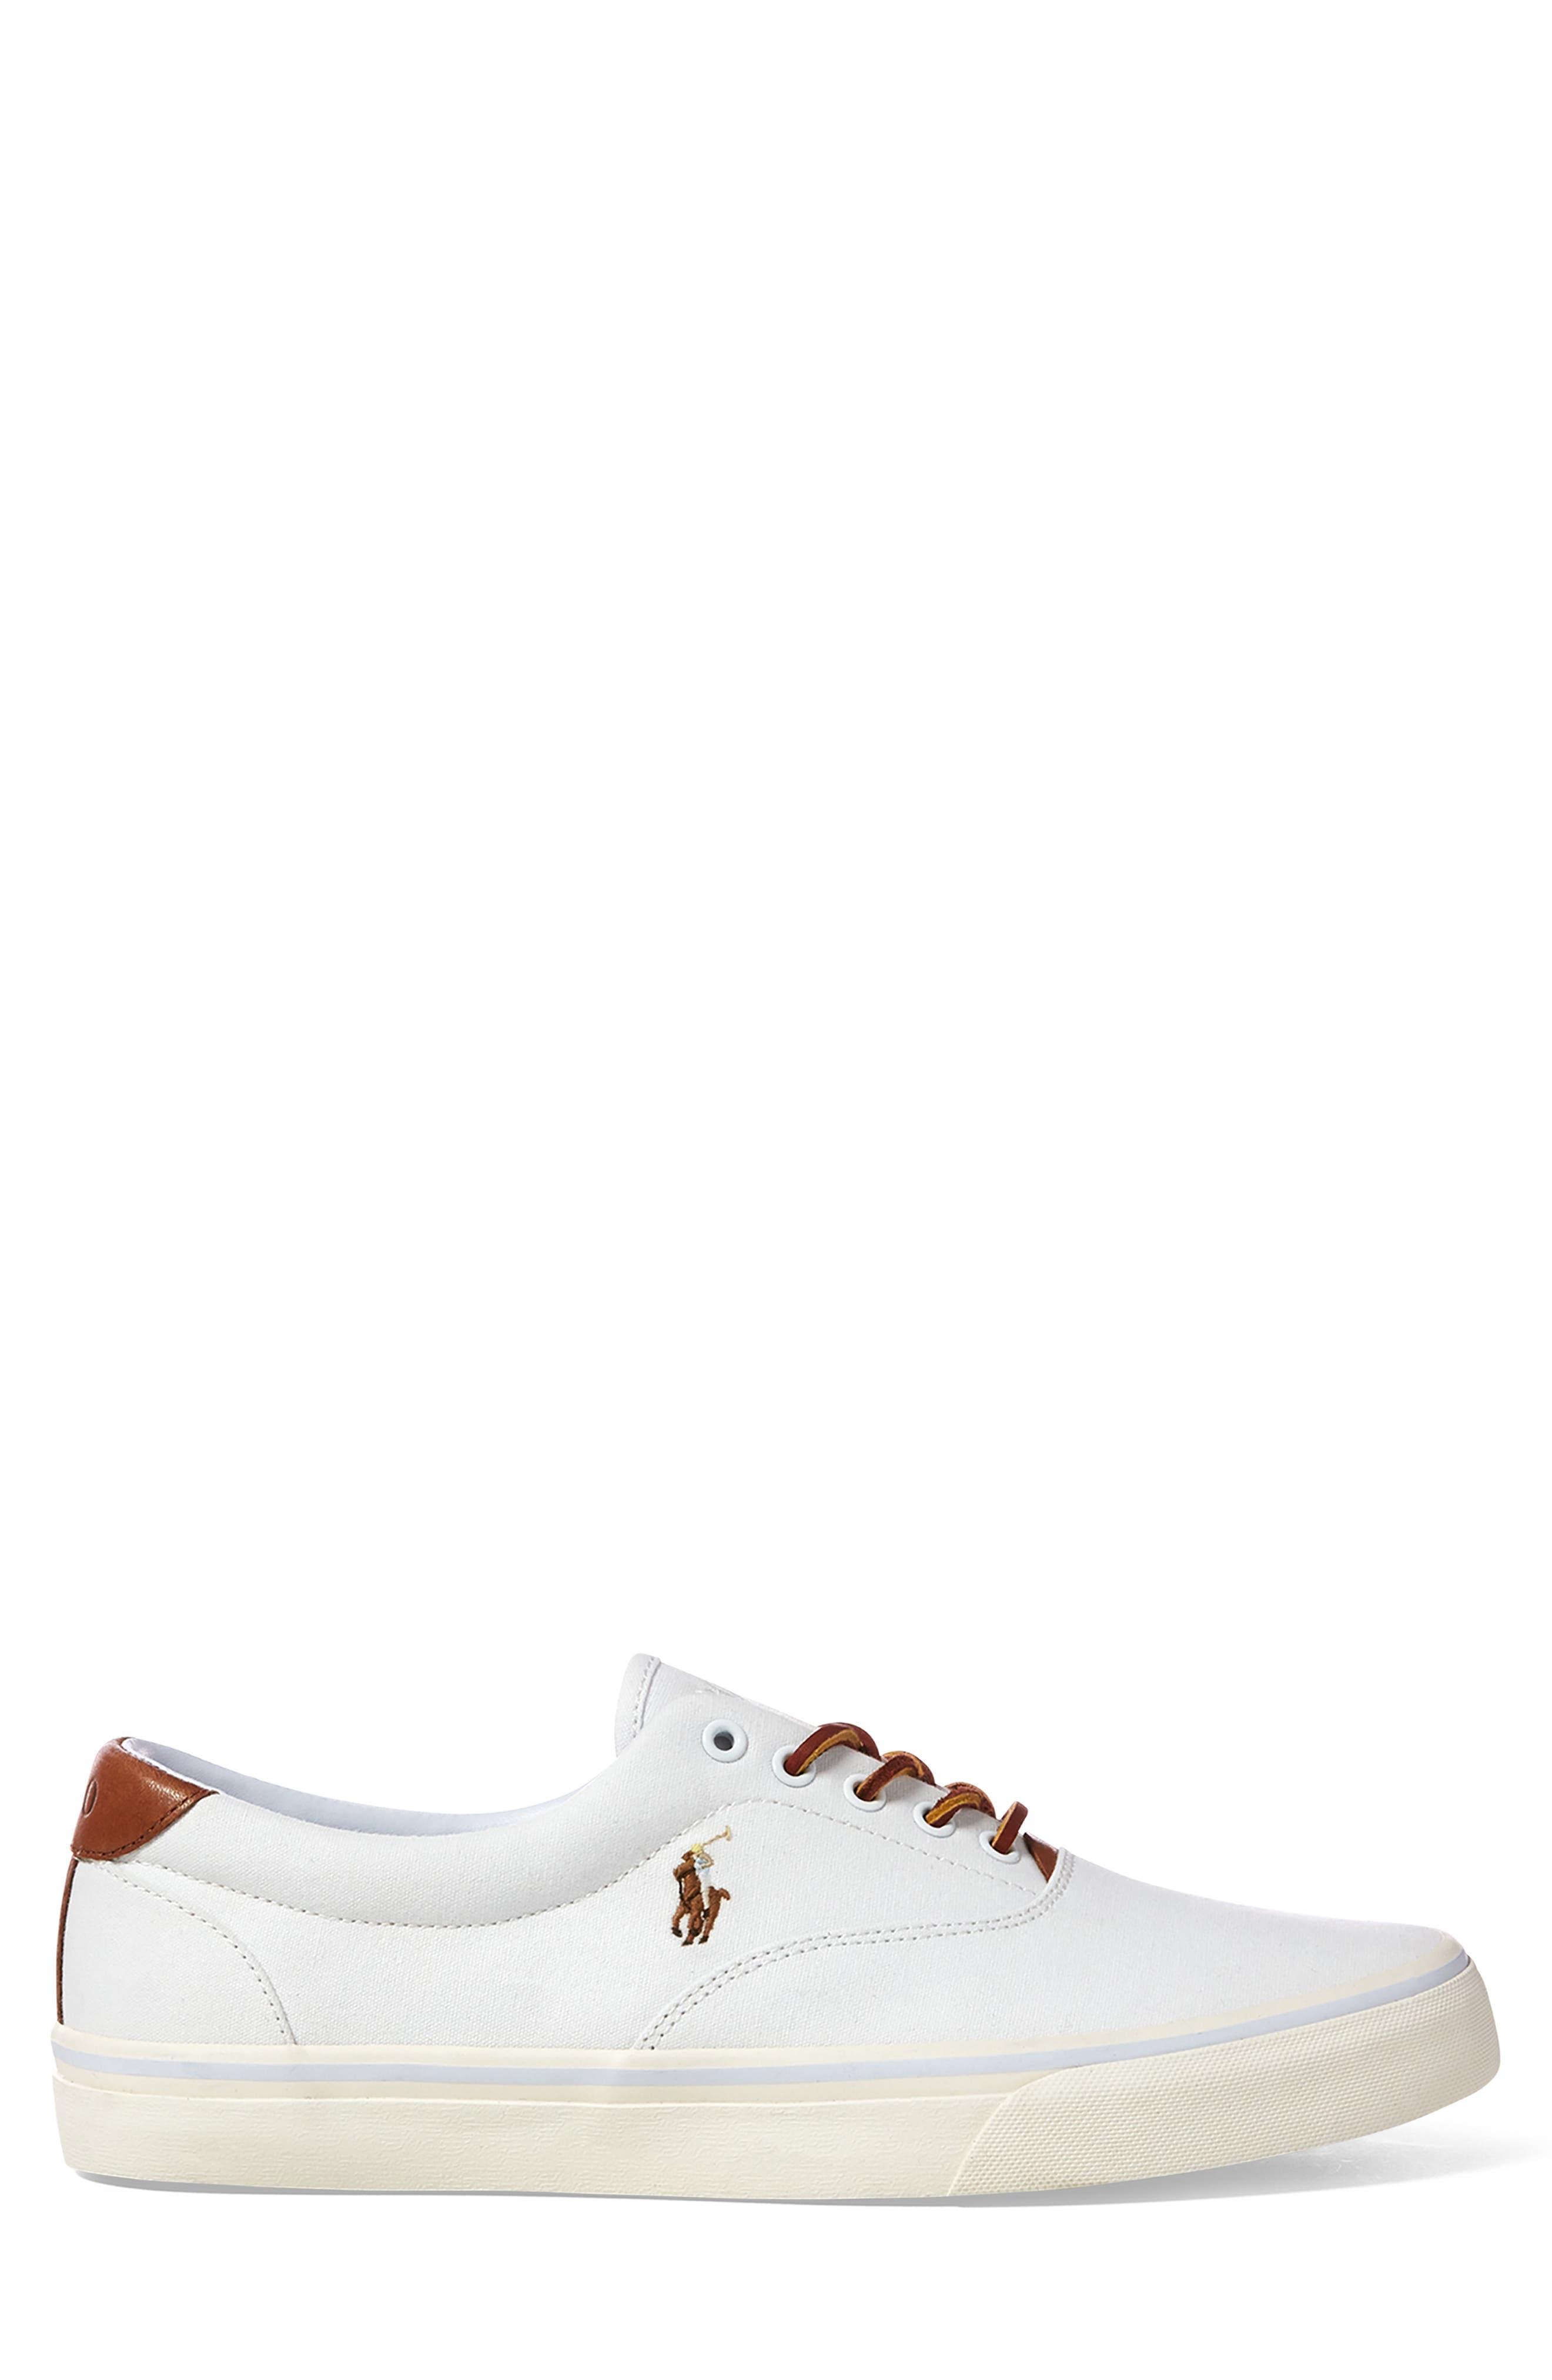 POLO RALPH LAUREN,                             Thorton Low Top Sneaker,                             Alternate thumbnail 2, color,                             WHITE CANVAS